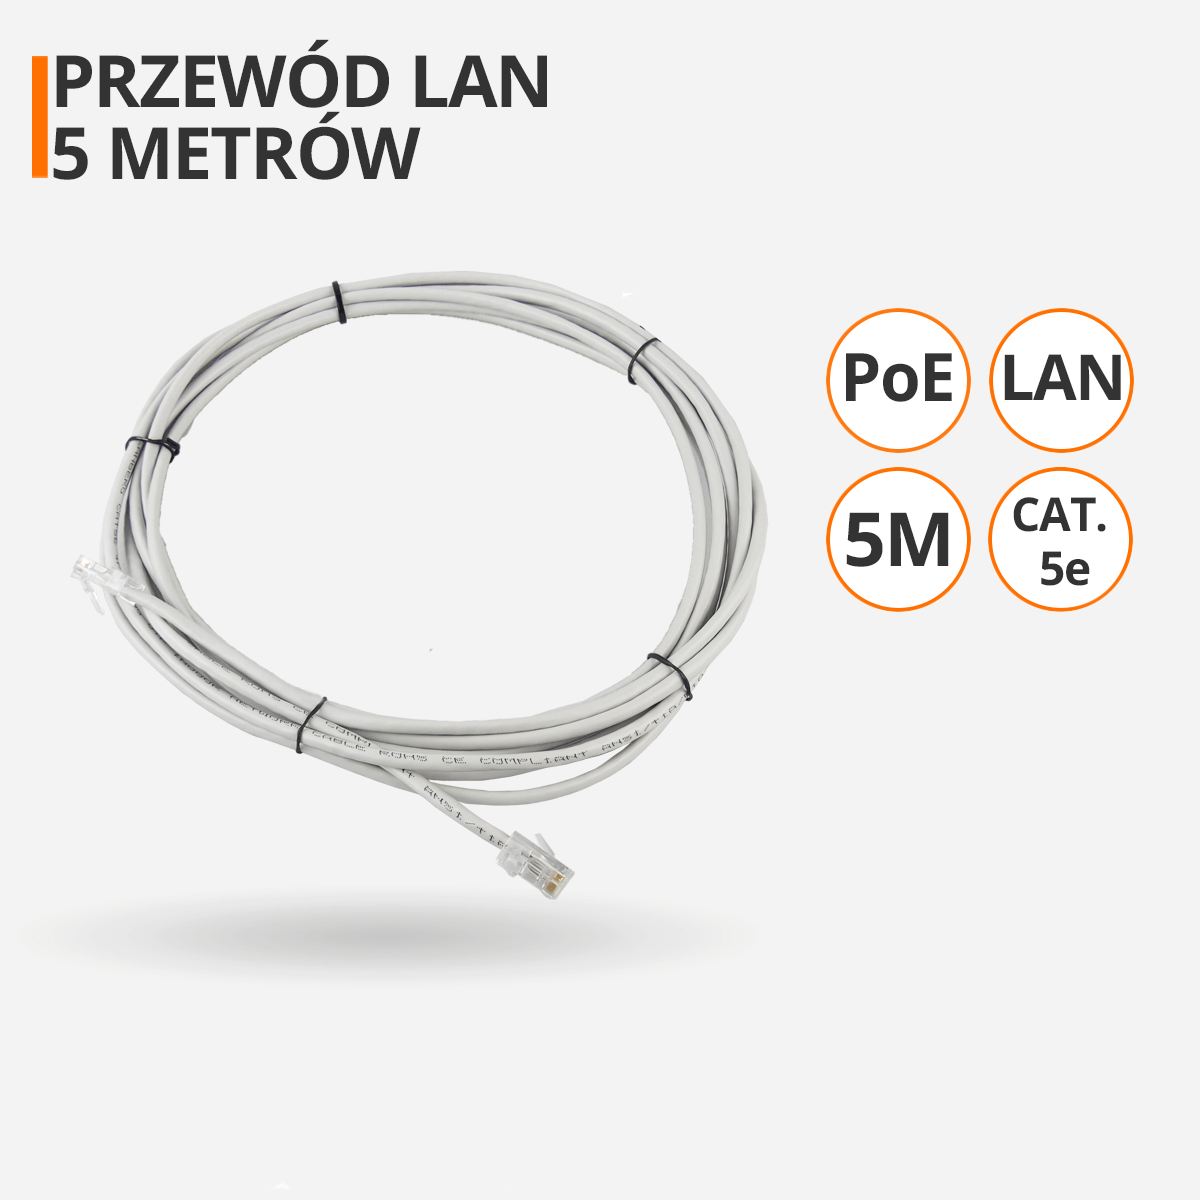 kabel-lan-poe-przewod-rj45-orllo-pl